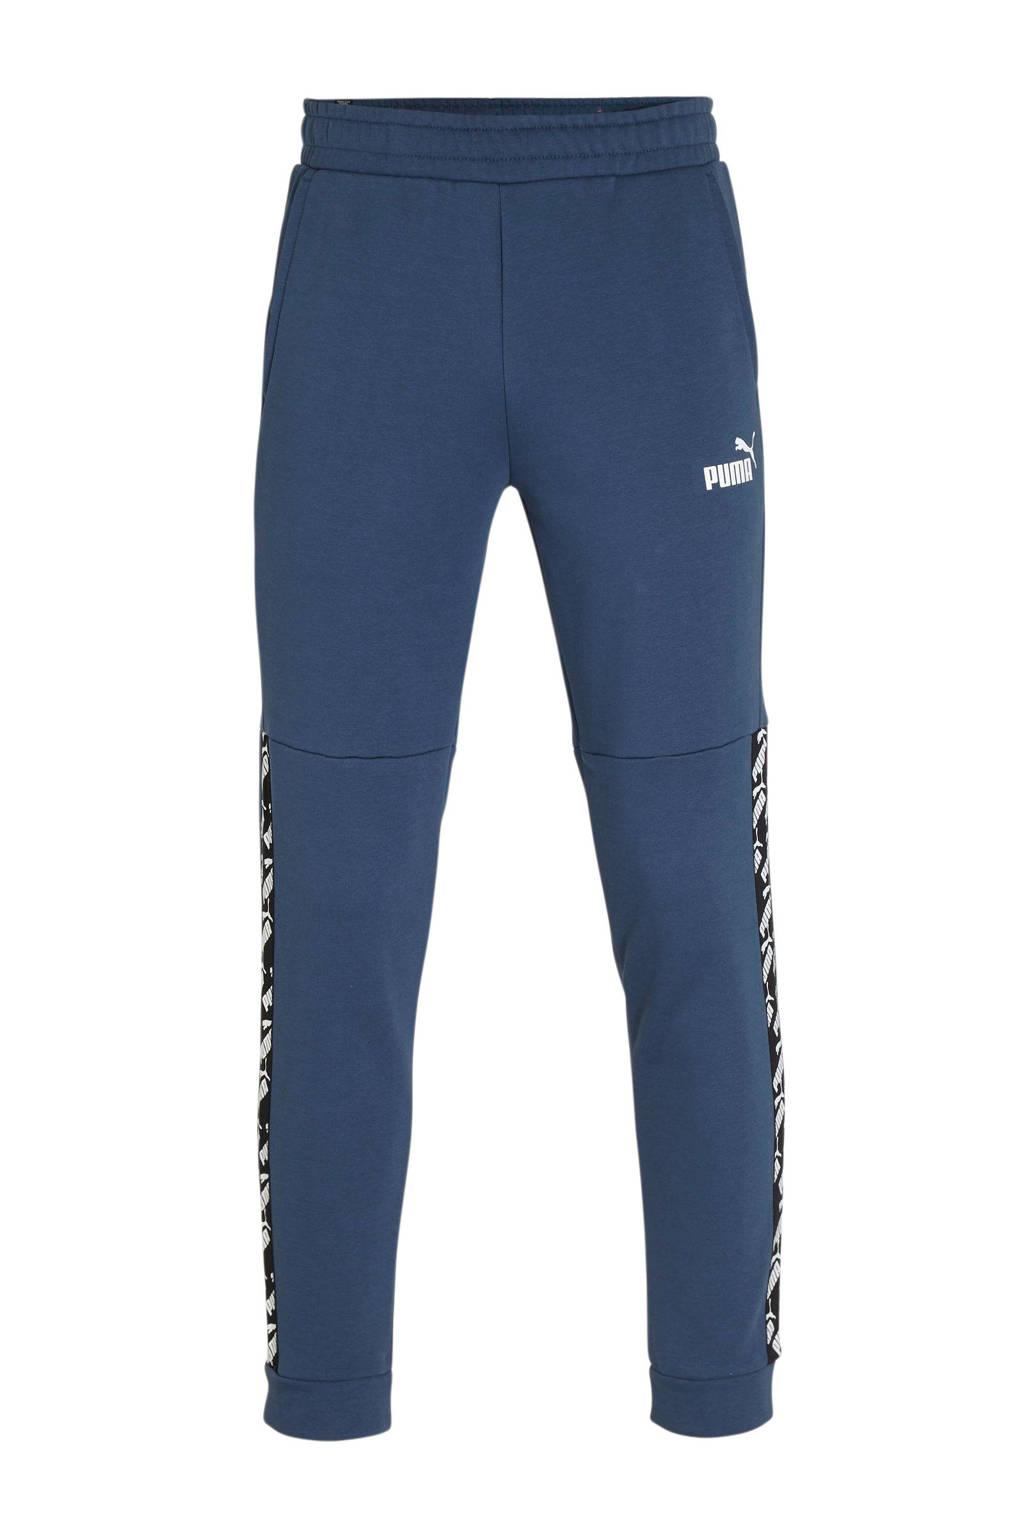 Puma joggingbroek blauw, Blauw